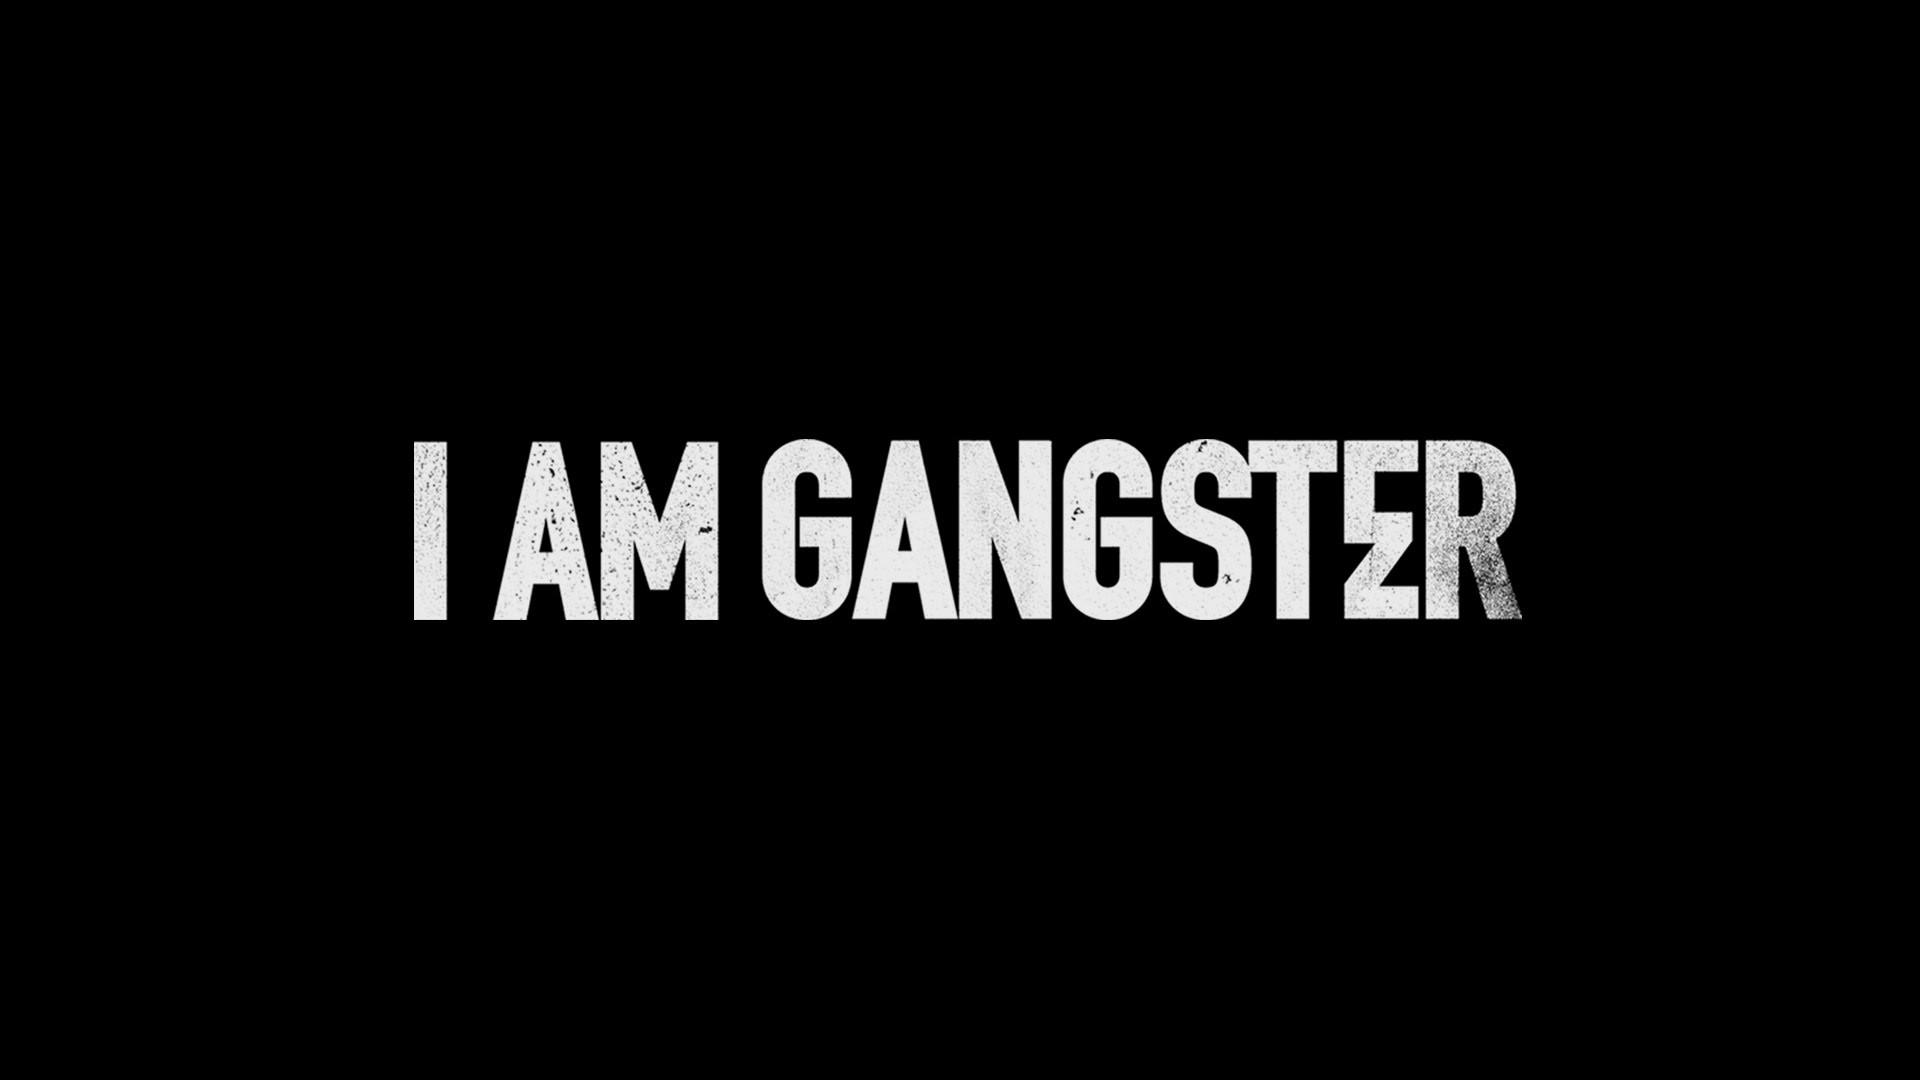 Boy And Girl Hd Wallpaper Free Download Gangster Vault Boy Wallpaper 38 Images